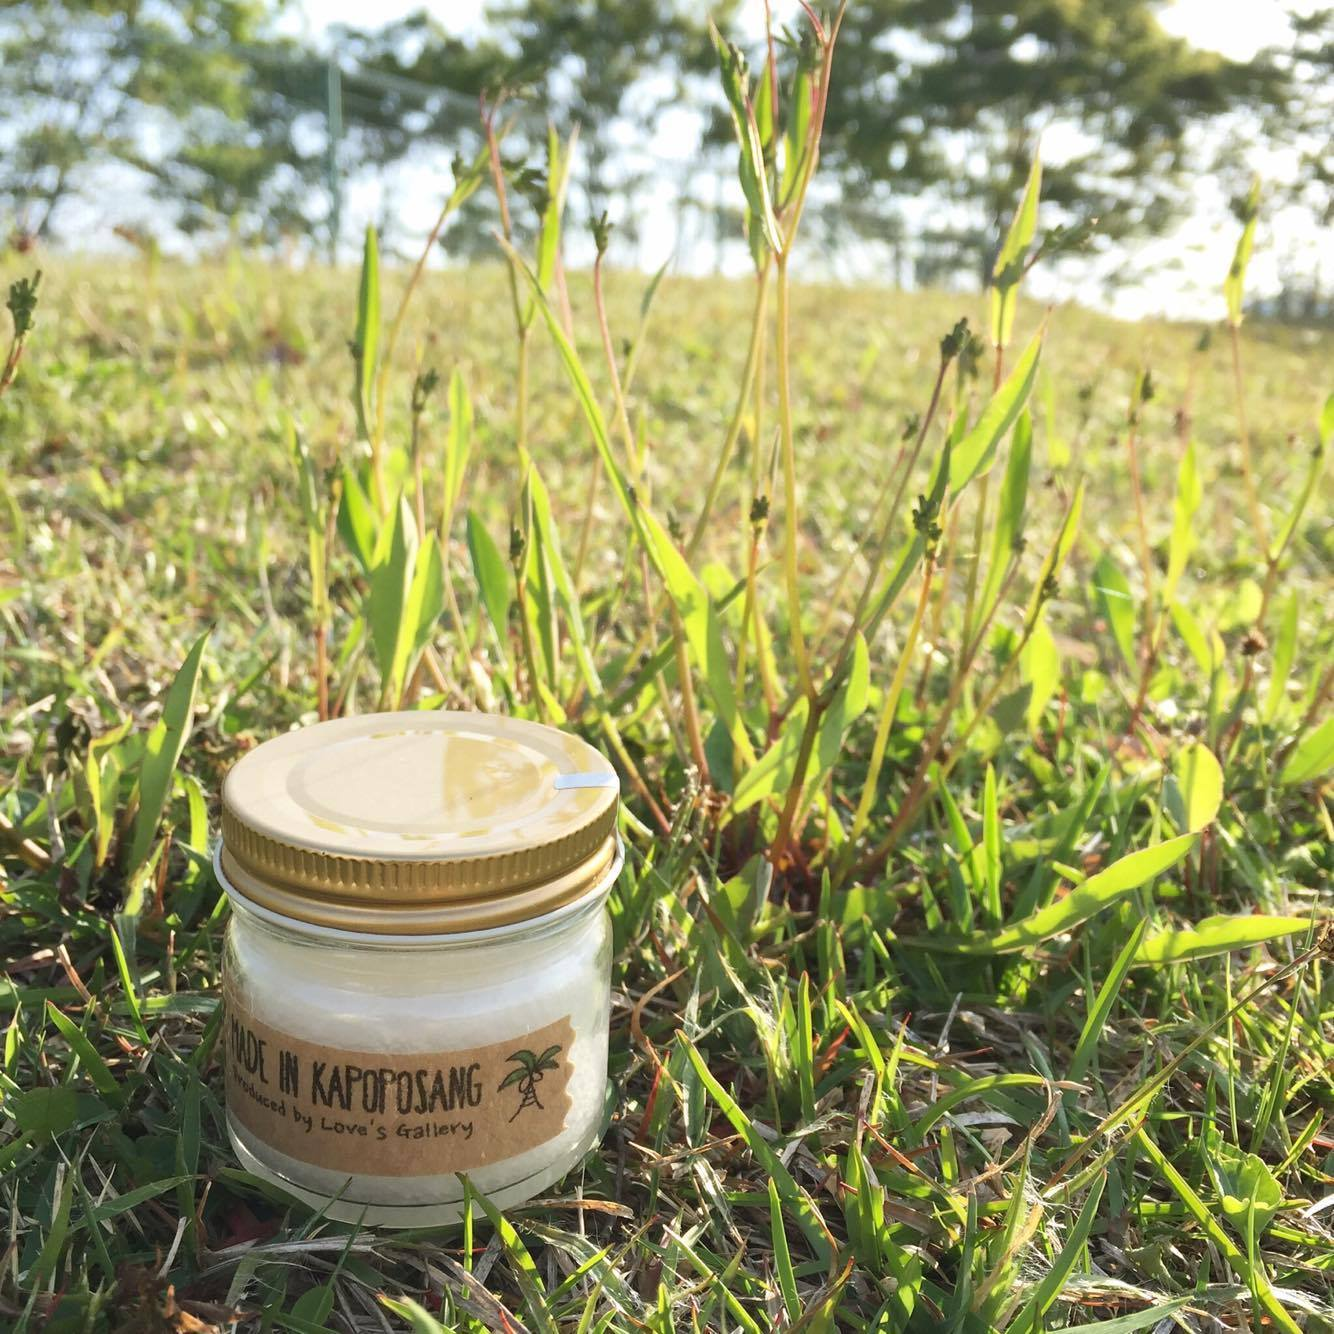 Fair Trade Virgin Coconut Oil mini jar 50g